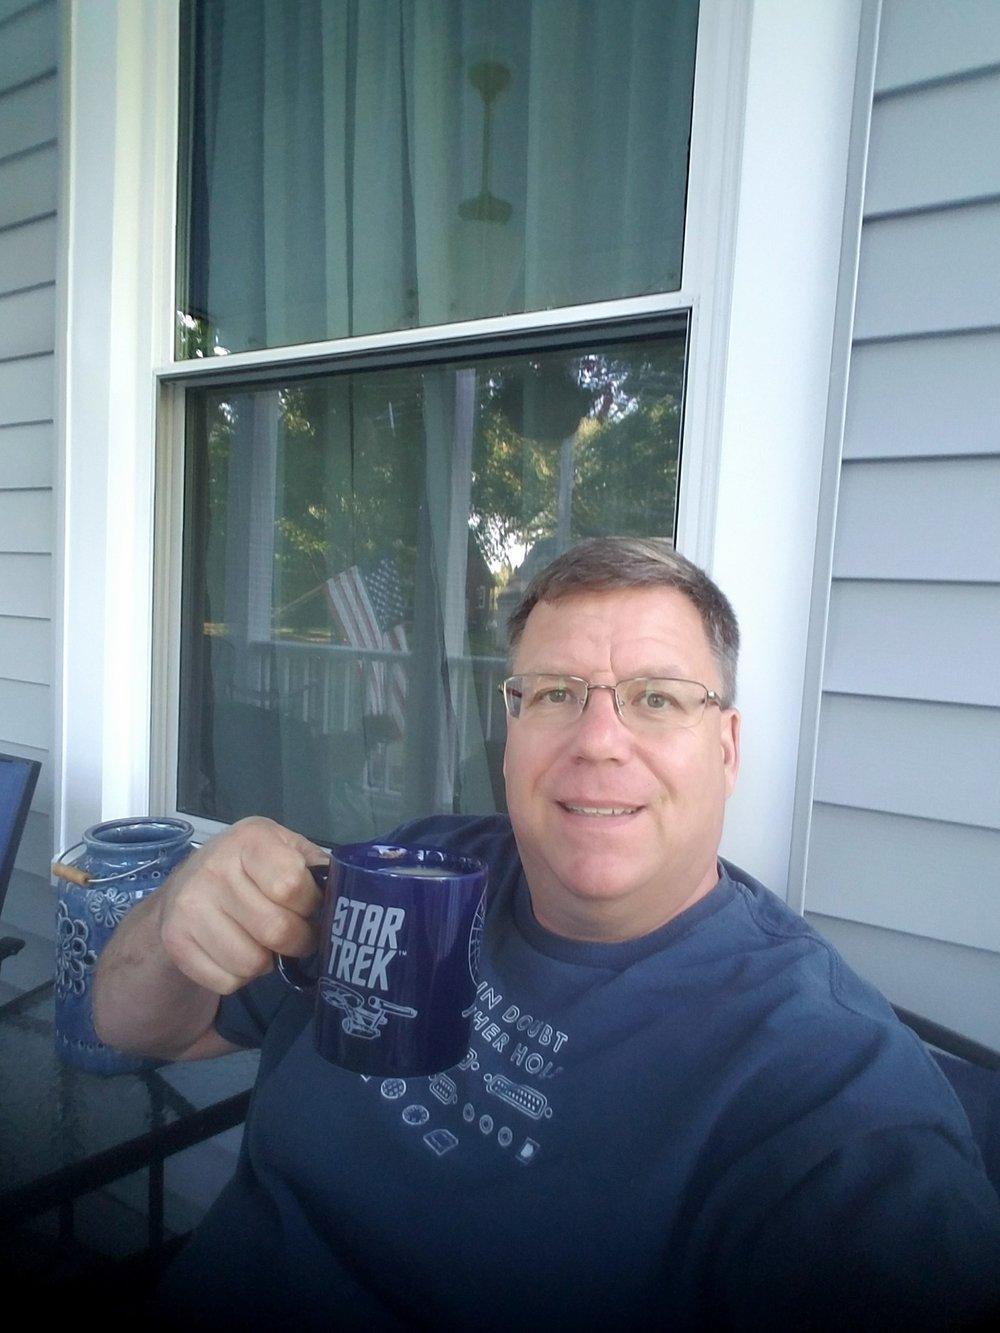 Norm, with his Star Trek mug